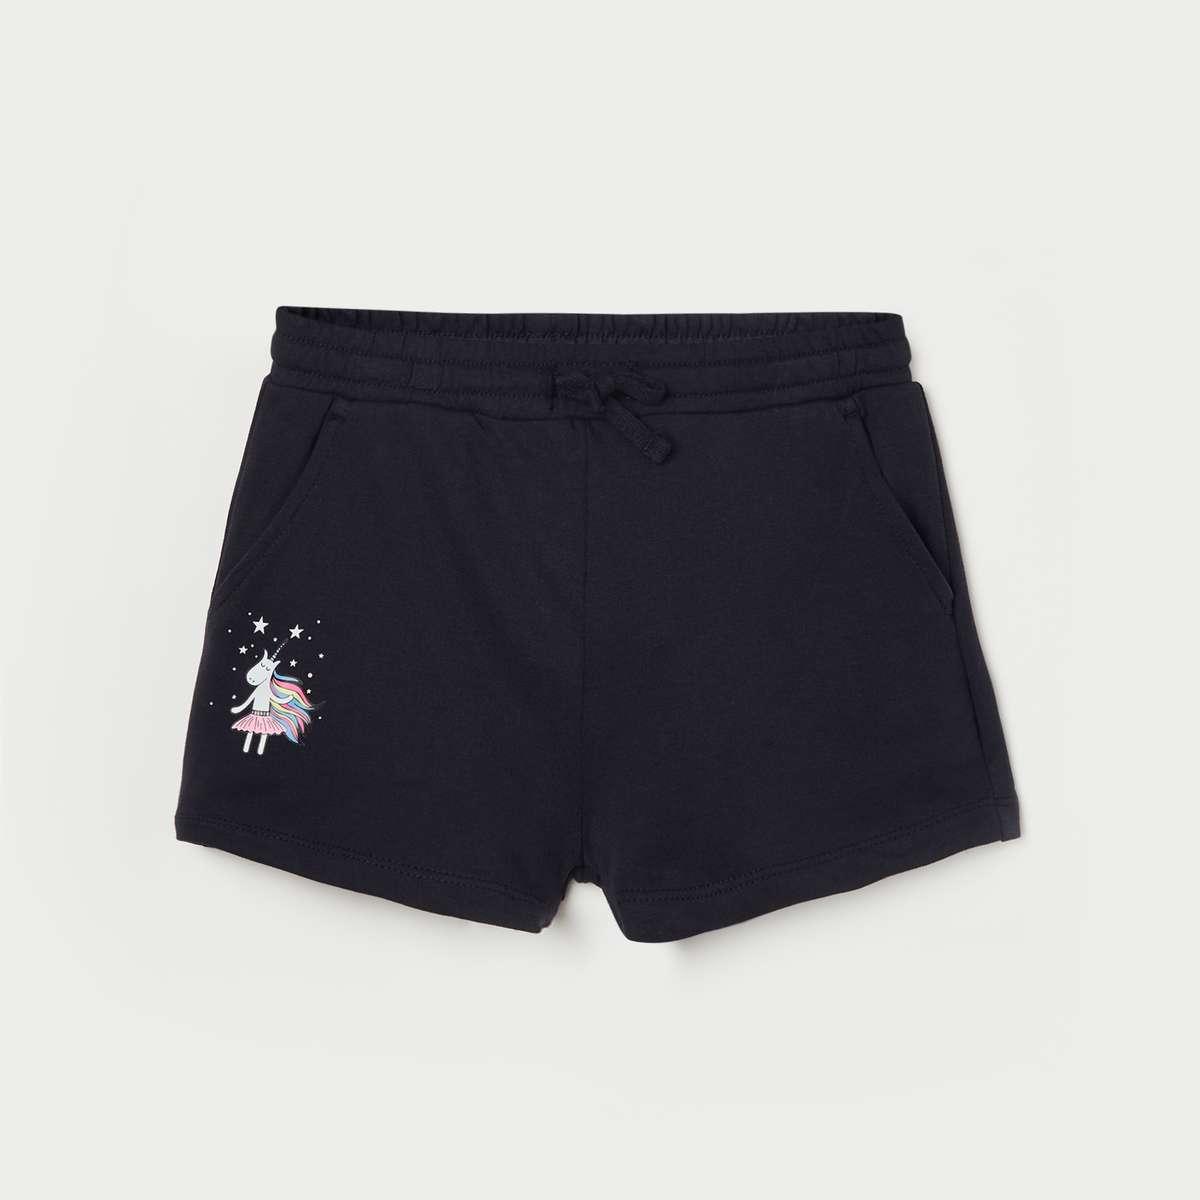 2.FAME FOREVER KIDS Girls Printed Shorts